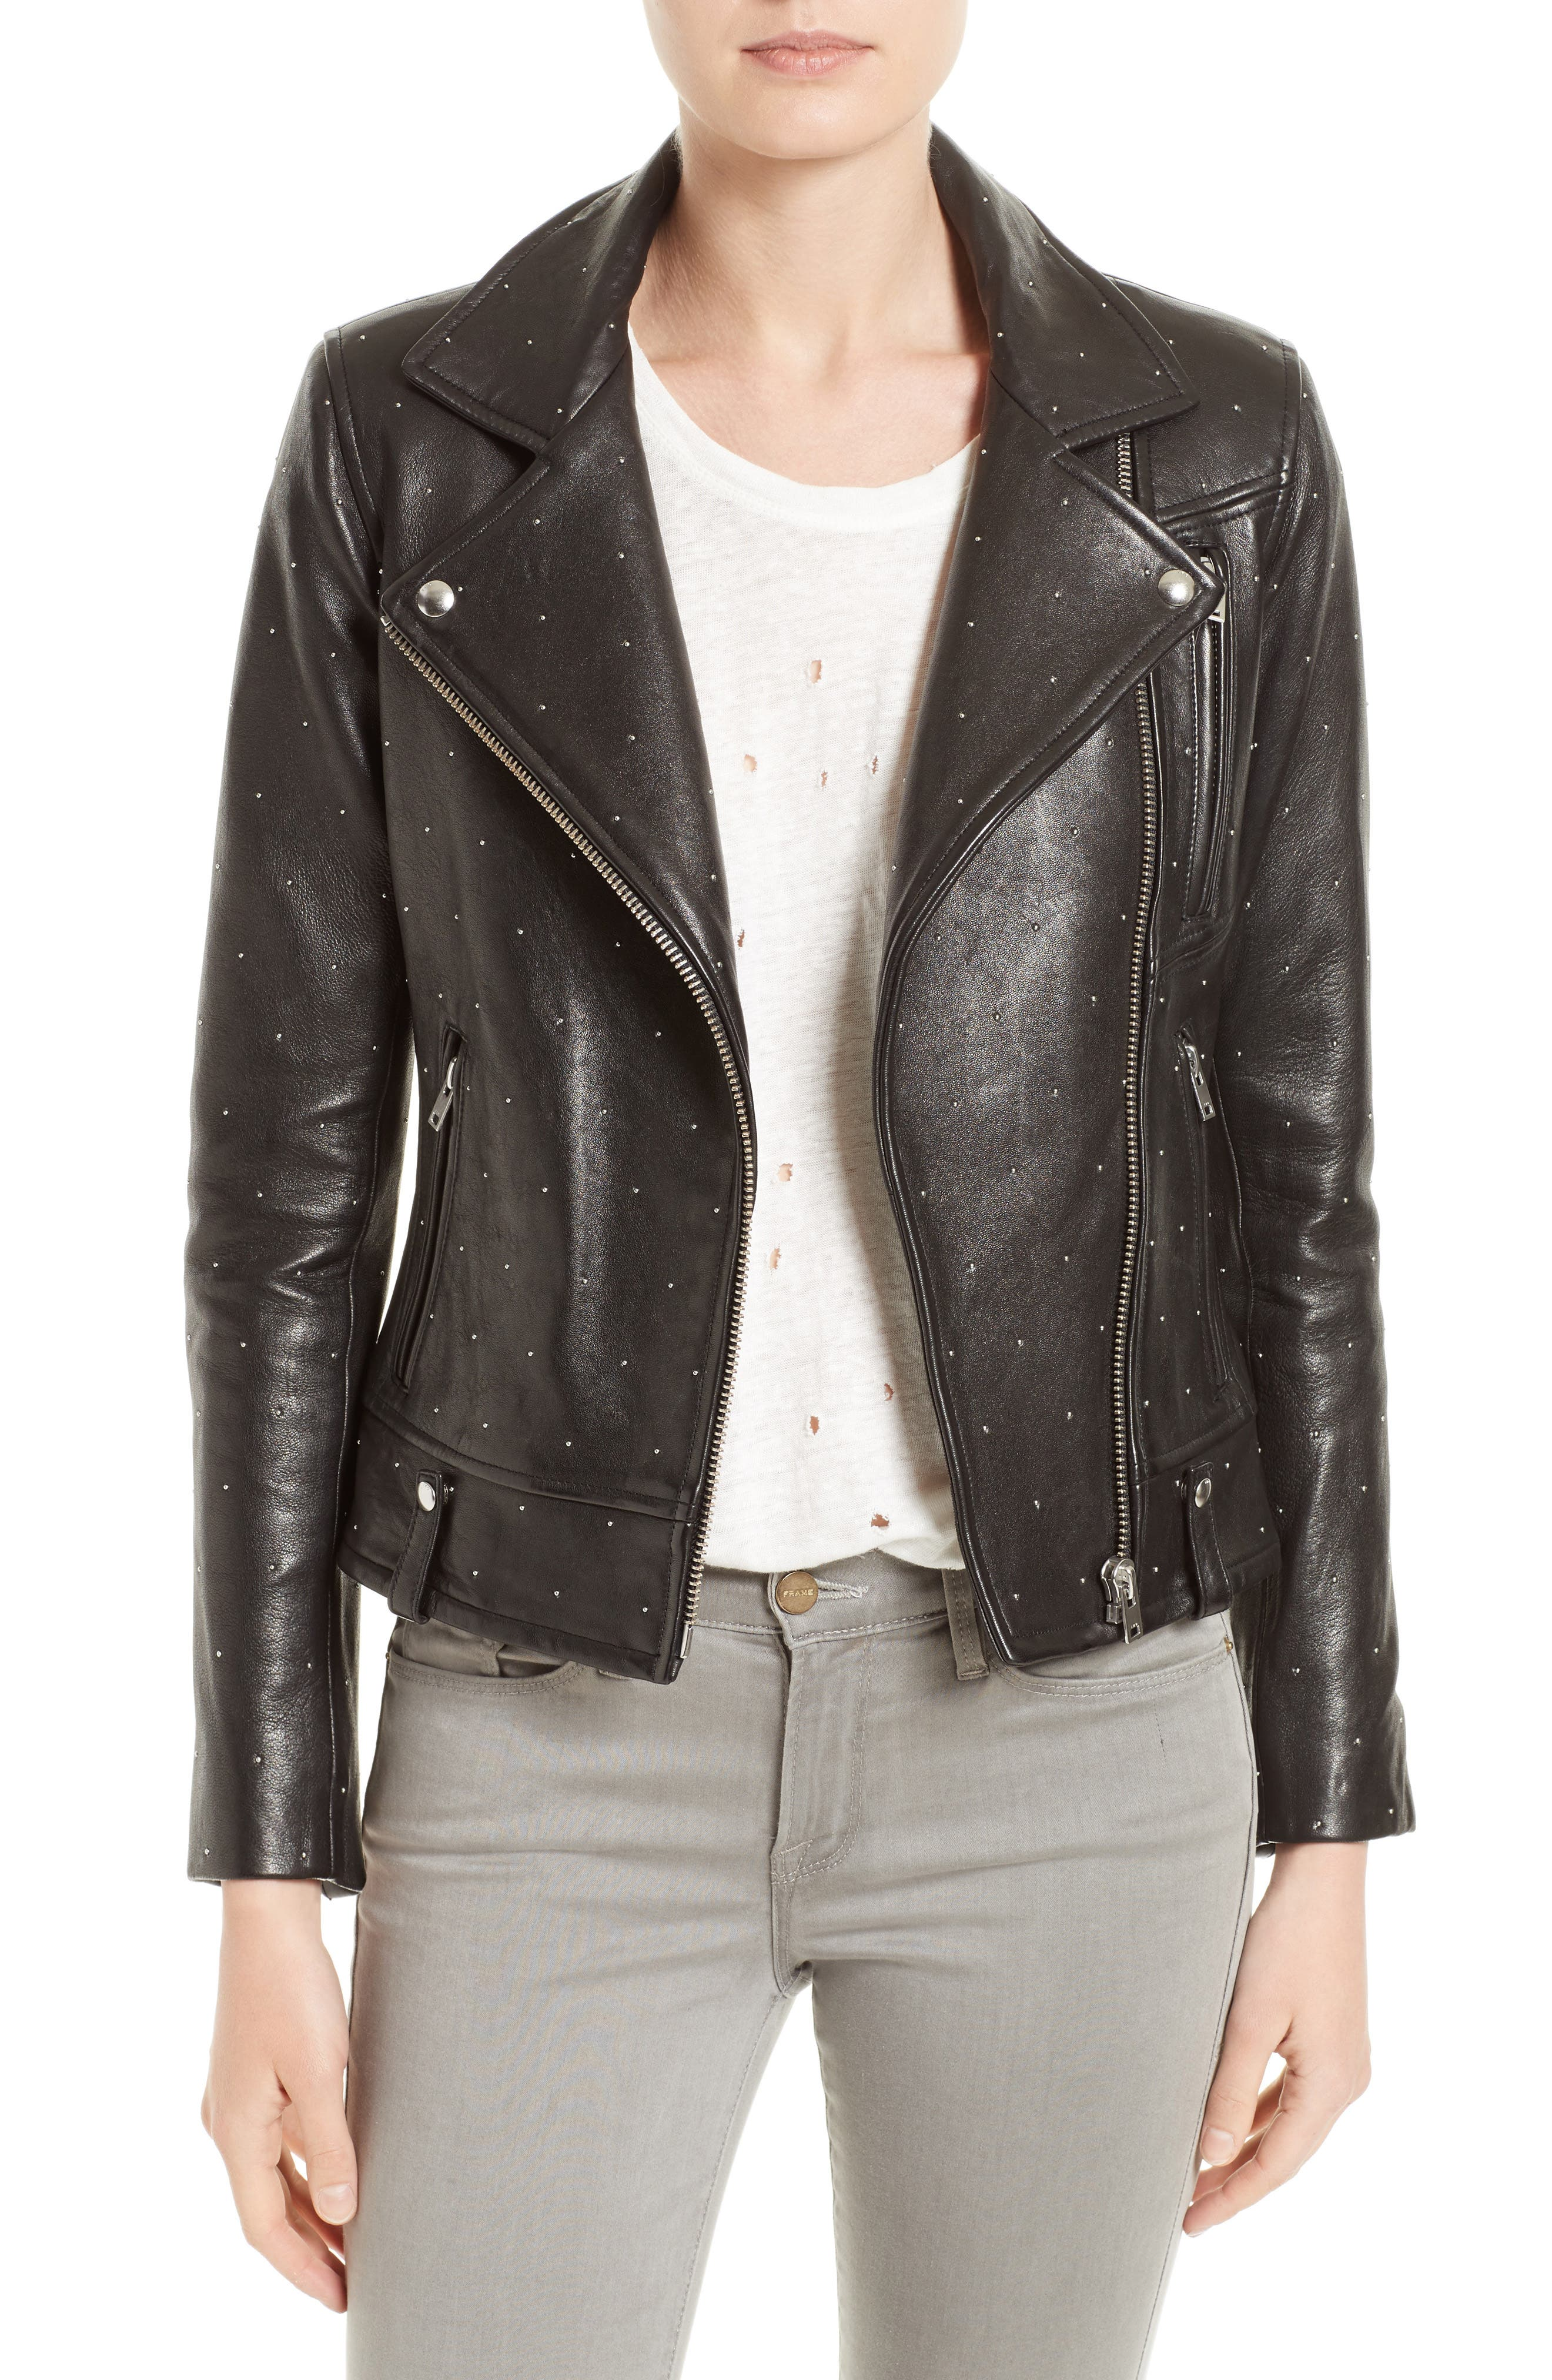 Vamy Studded Leather Moto Jacket,                         Main,                         color, Black